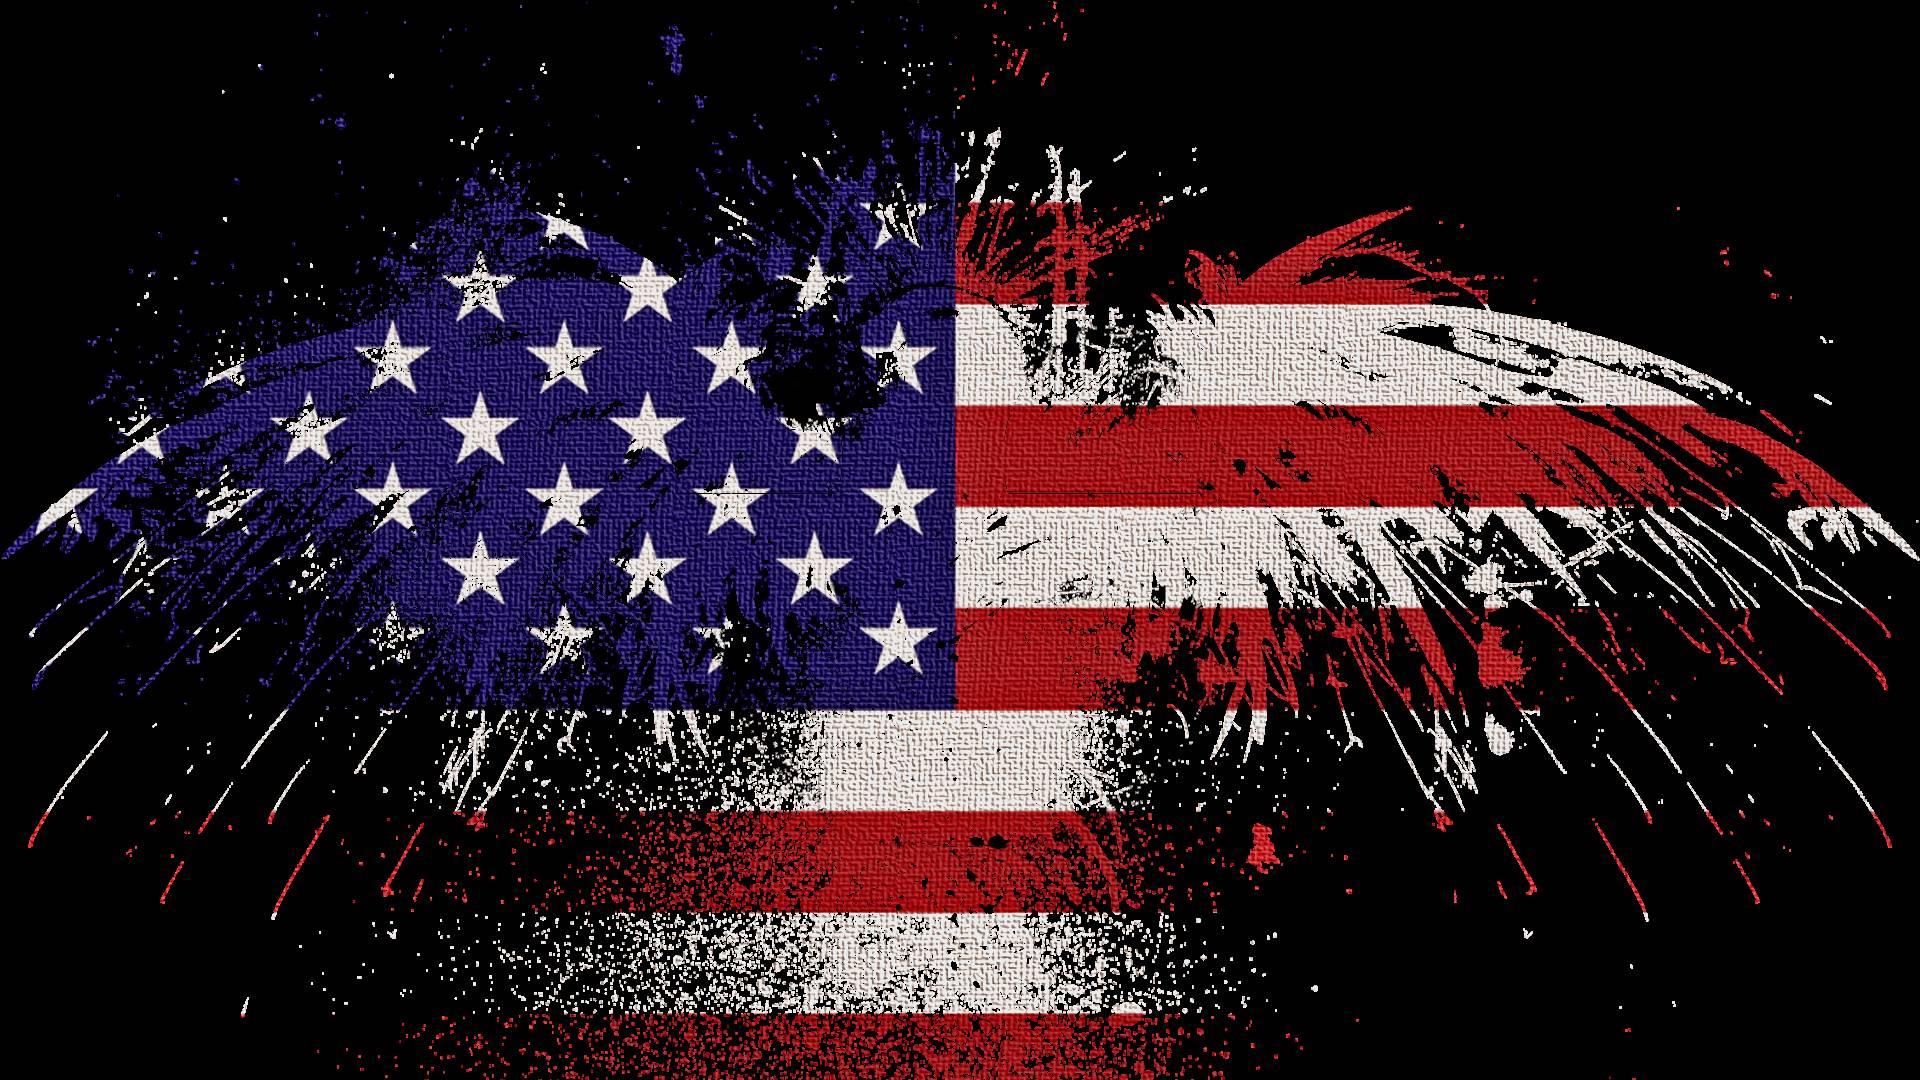 Patriotic Christmas Background.Patriotic Christmas Wallpapers Top Free Patriotic